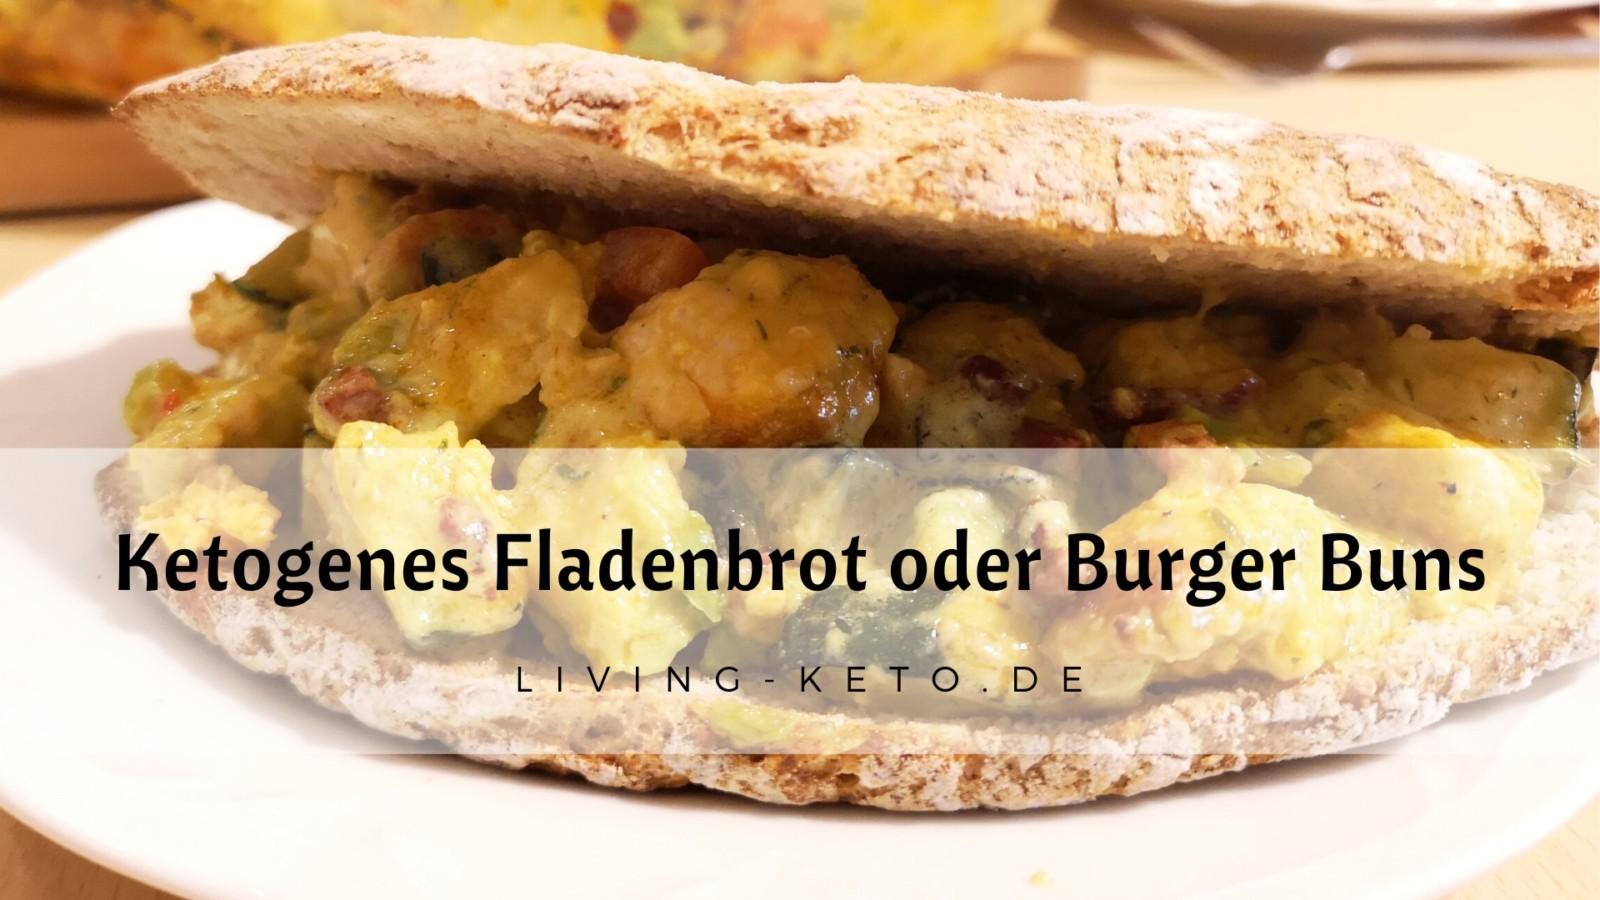 Keto Fladenbrot – ketogene Burger Buns